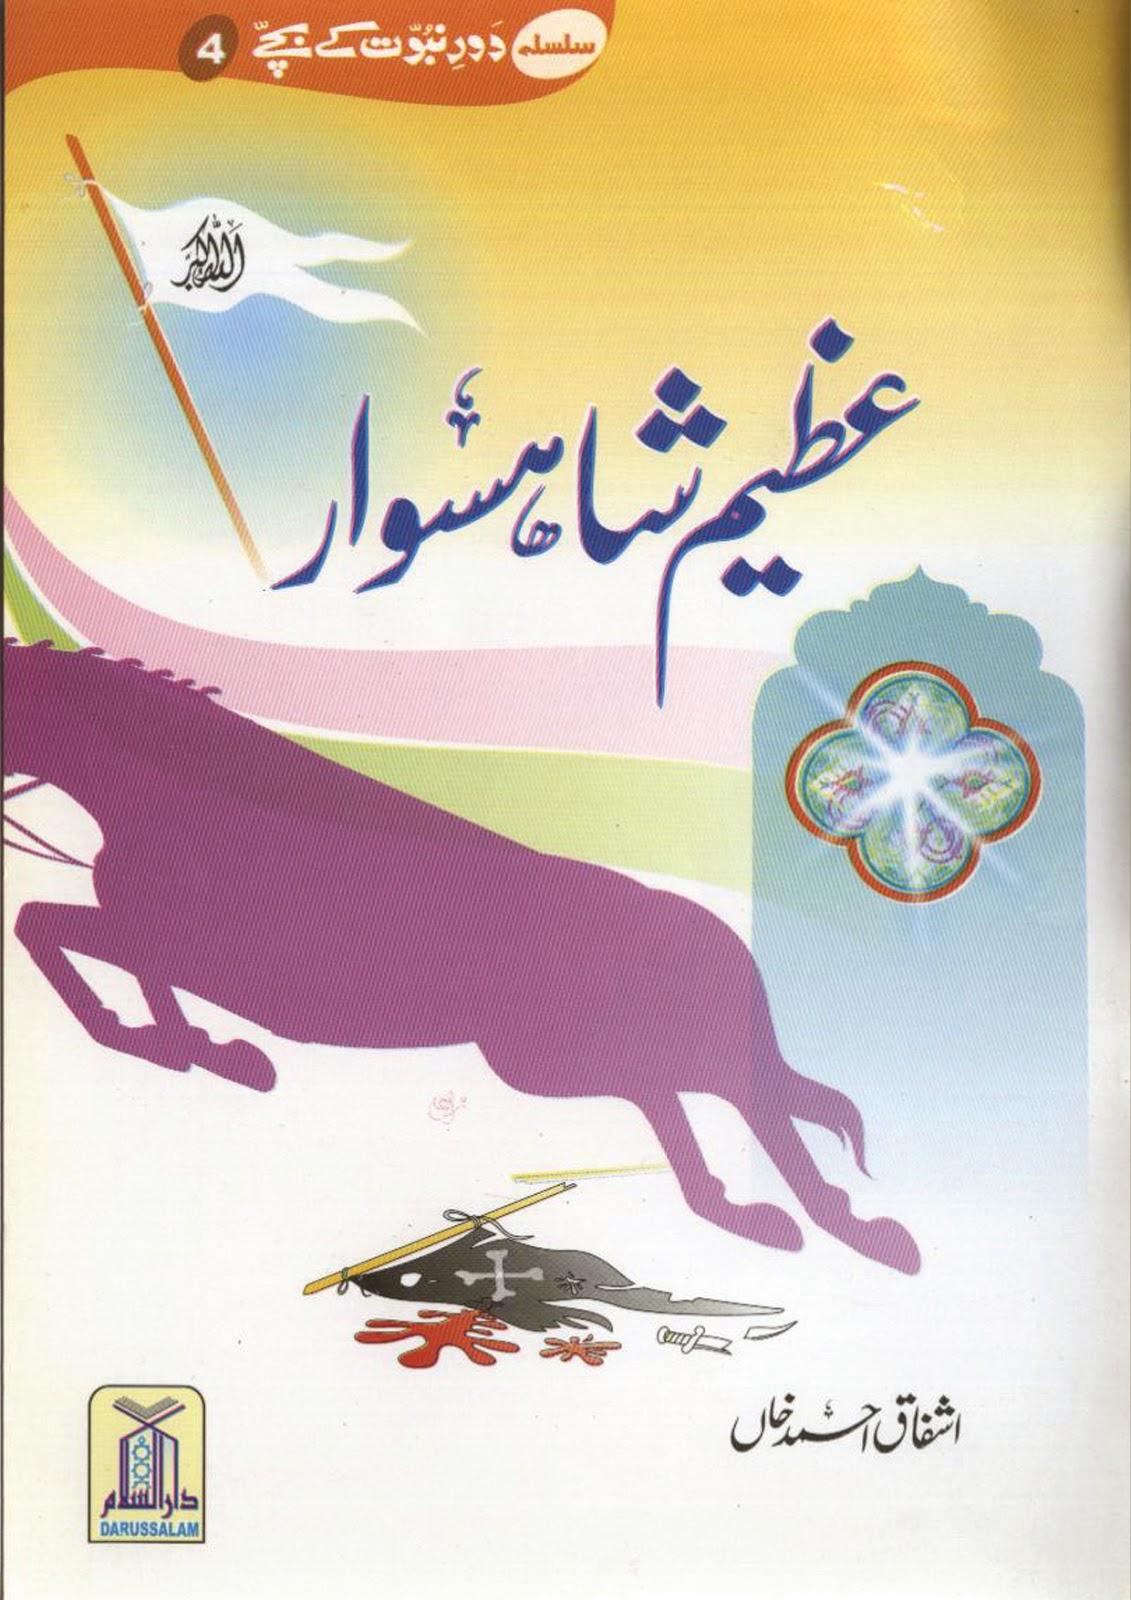 http://urduguru1.blogspot.com/2014/02/azeem-shasawar-abdullah-bin-zubair-ra.html